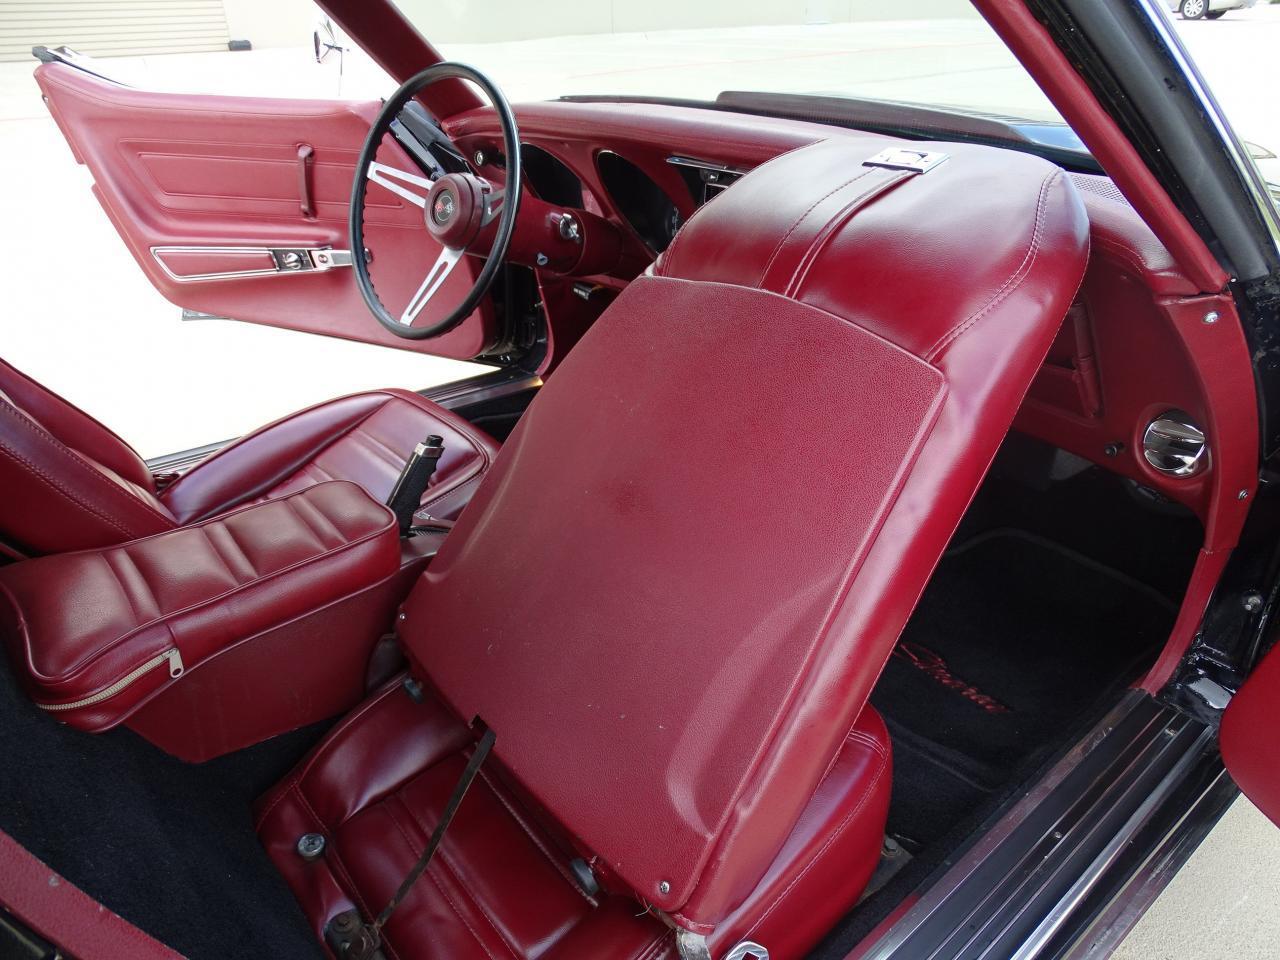 Large Picture of '74 Chevrolet Corvette - $29,995.00 - LAOQ